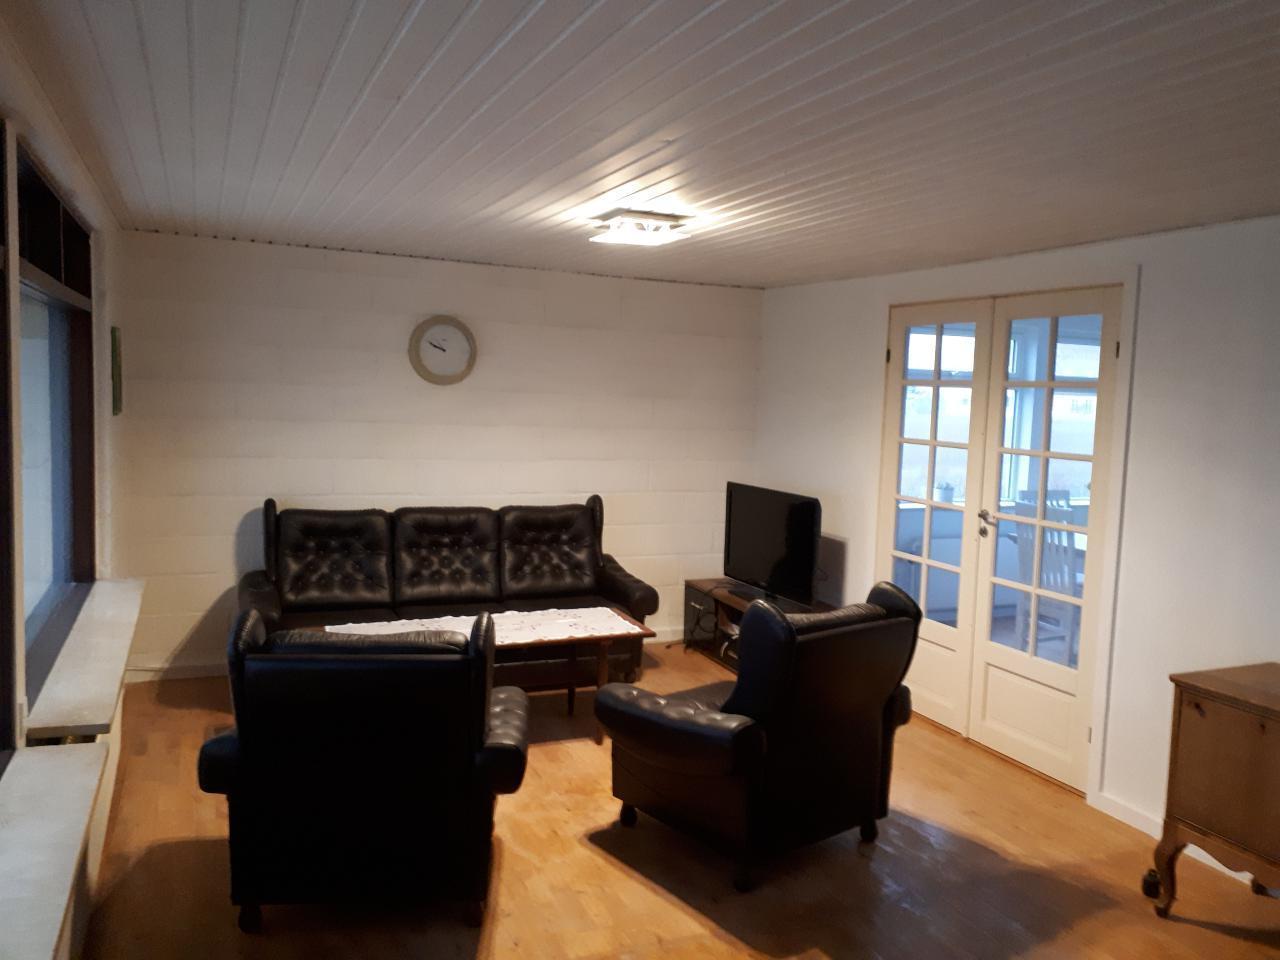 Ferienhaus Tklhus Aeroe (2549744), Ærøskøbing, , Ærø, Dänemark, Bild 4